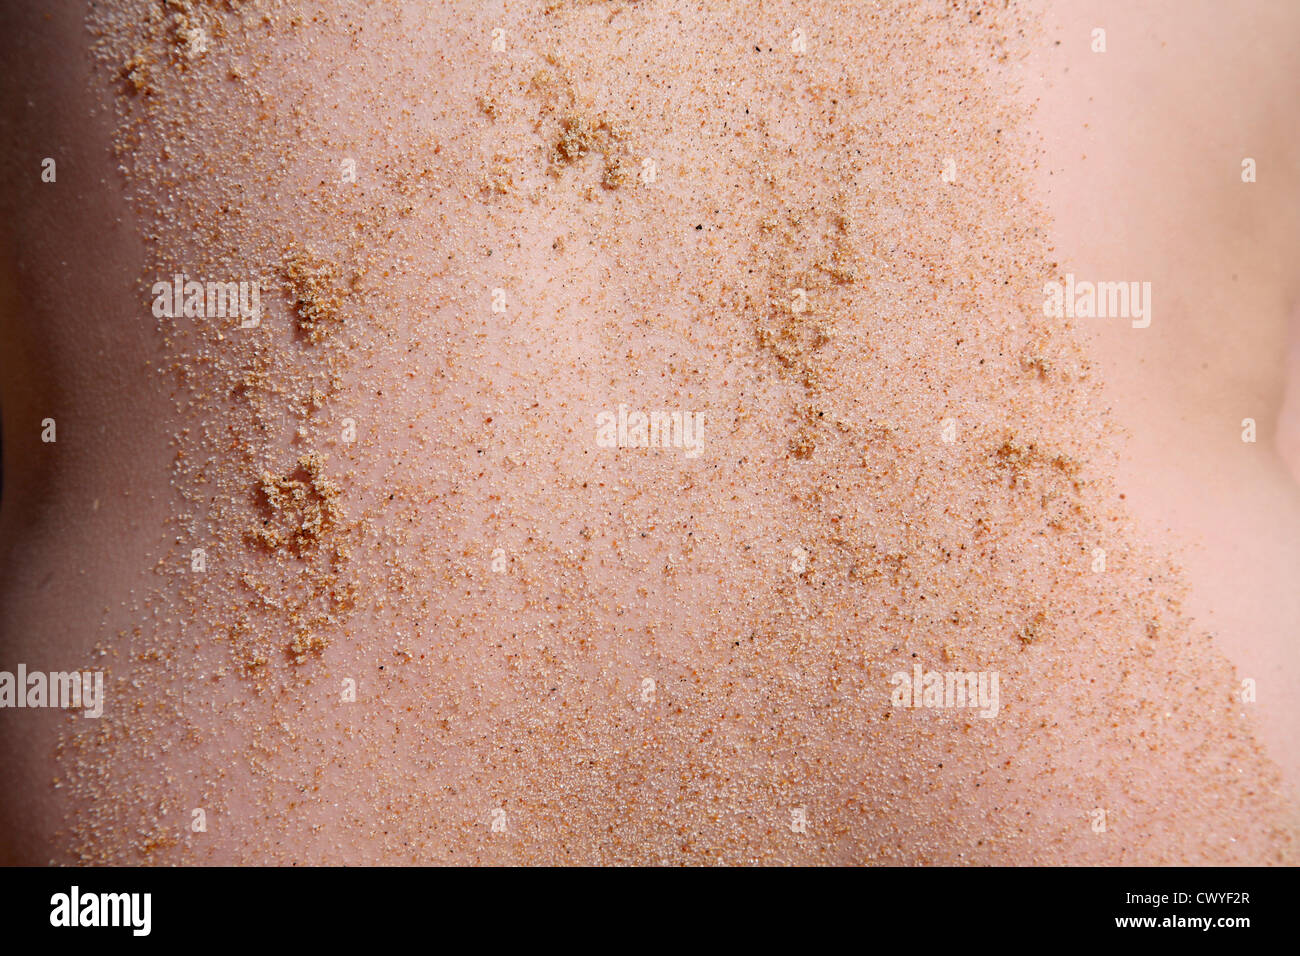 Sandy Skin - Stock Image